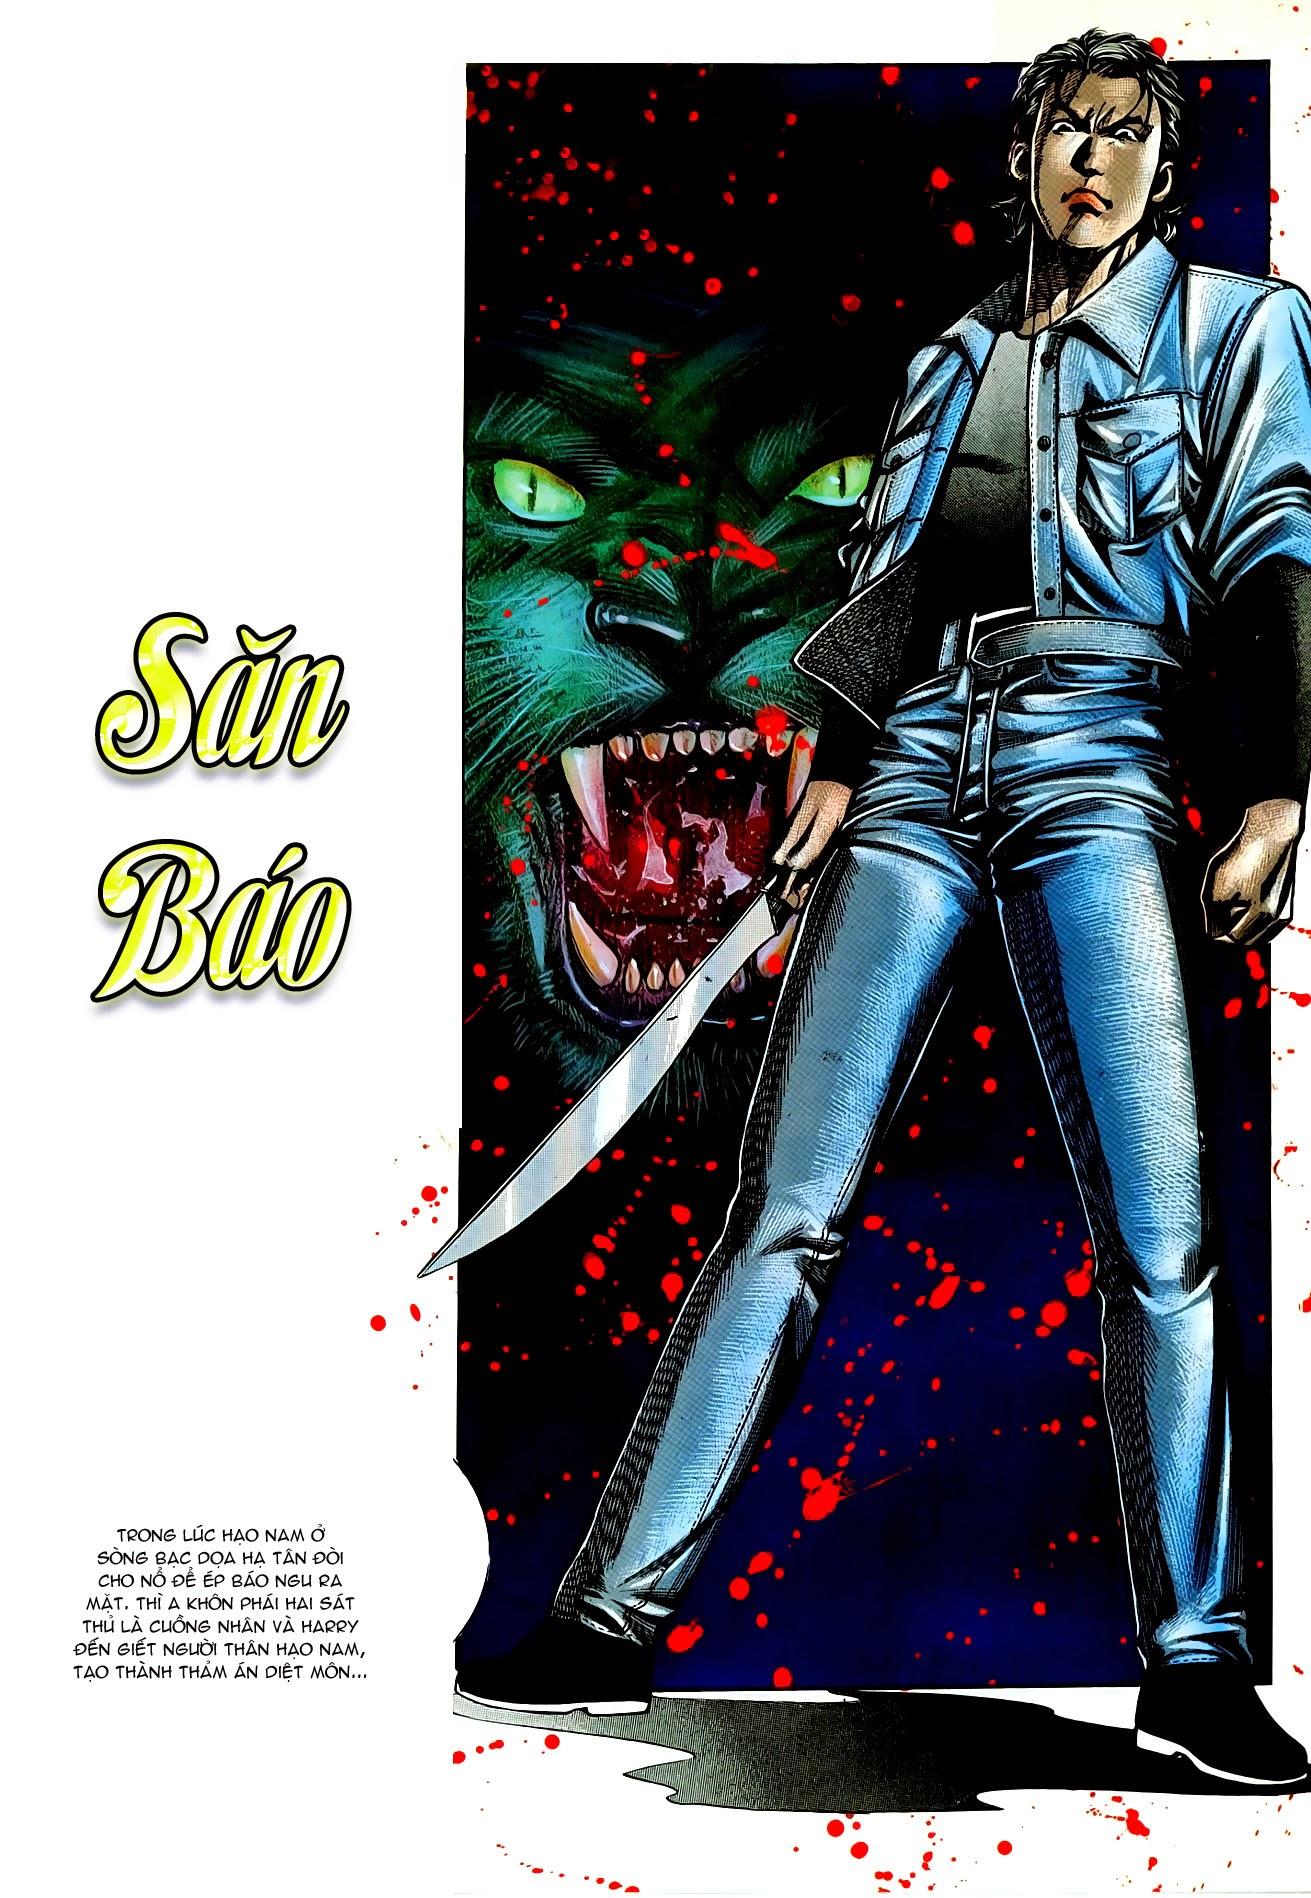 Người Trong Giang Hồ chapter 86: săn báo trang 1